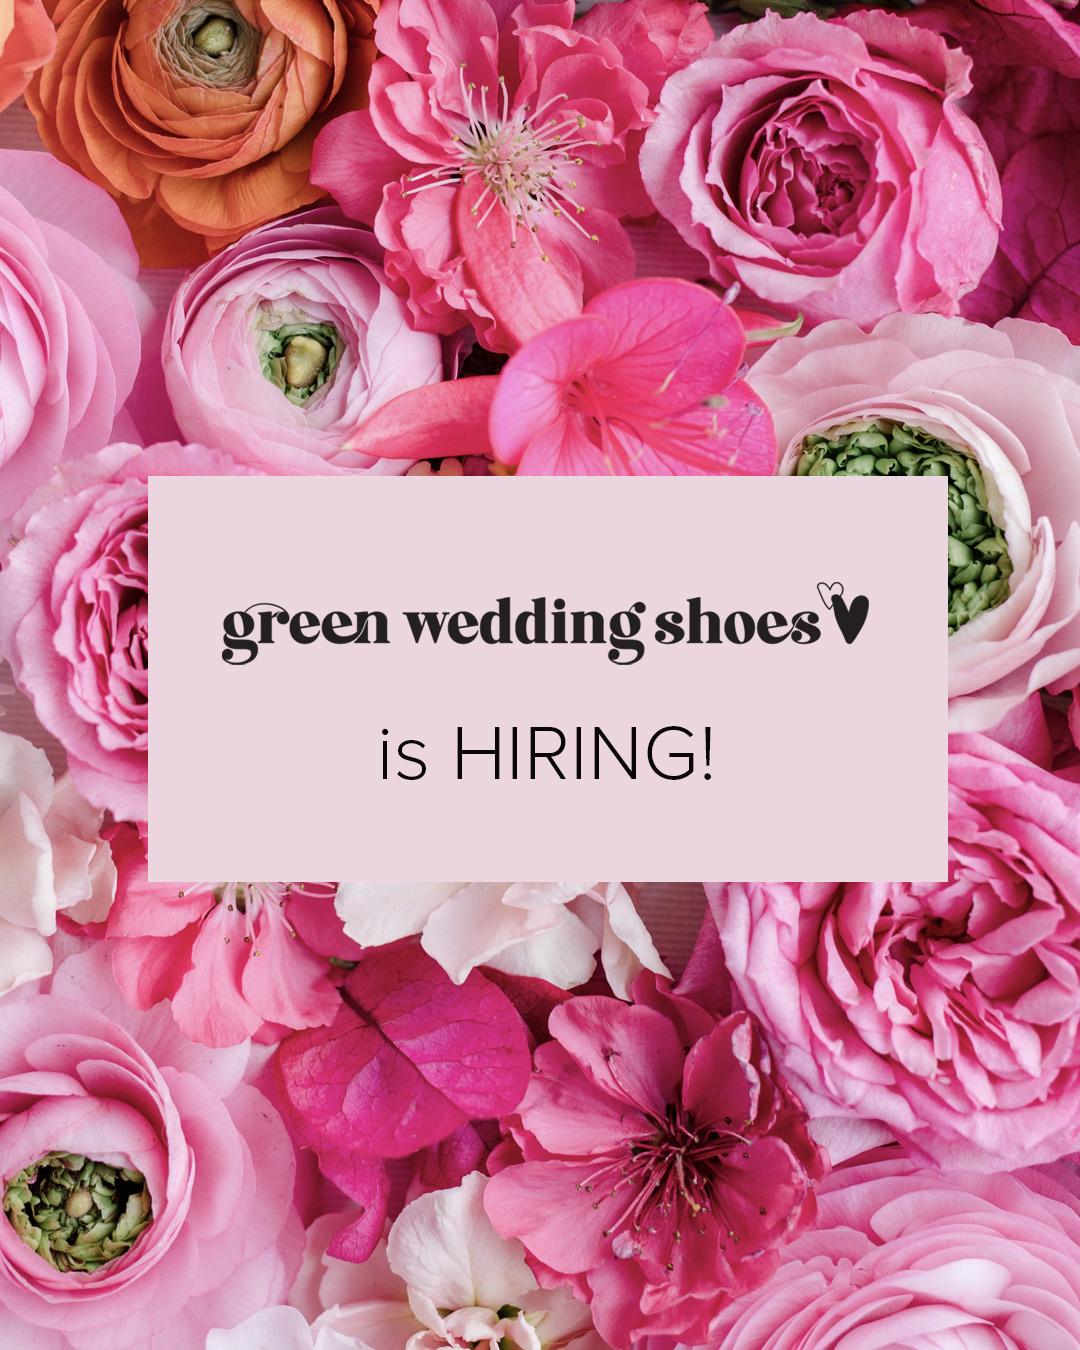 Green Wedding Shoes is Hiring!